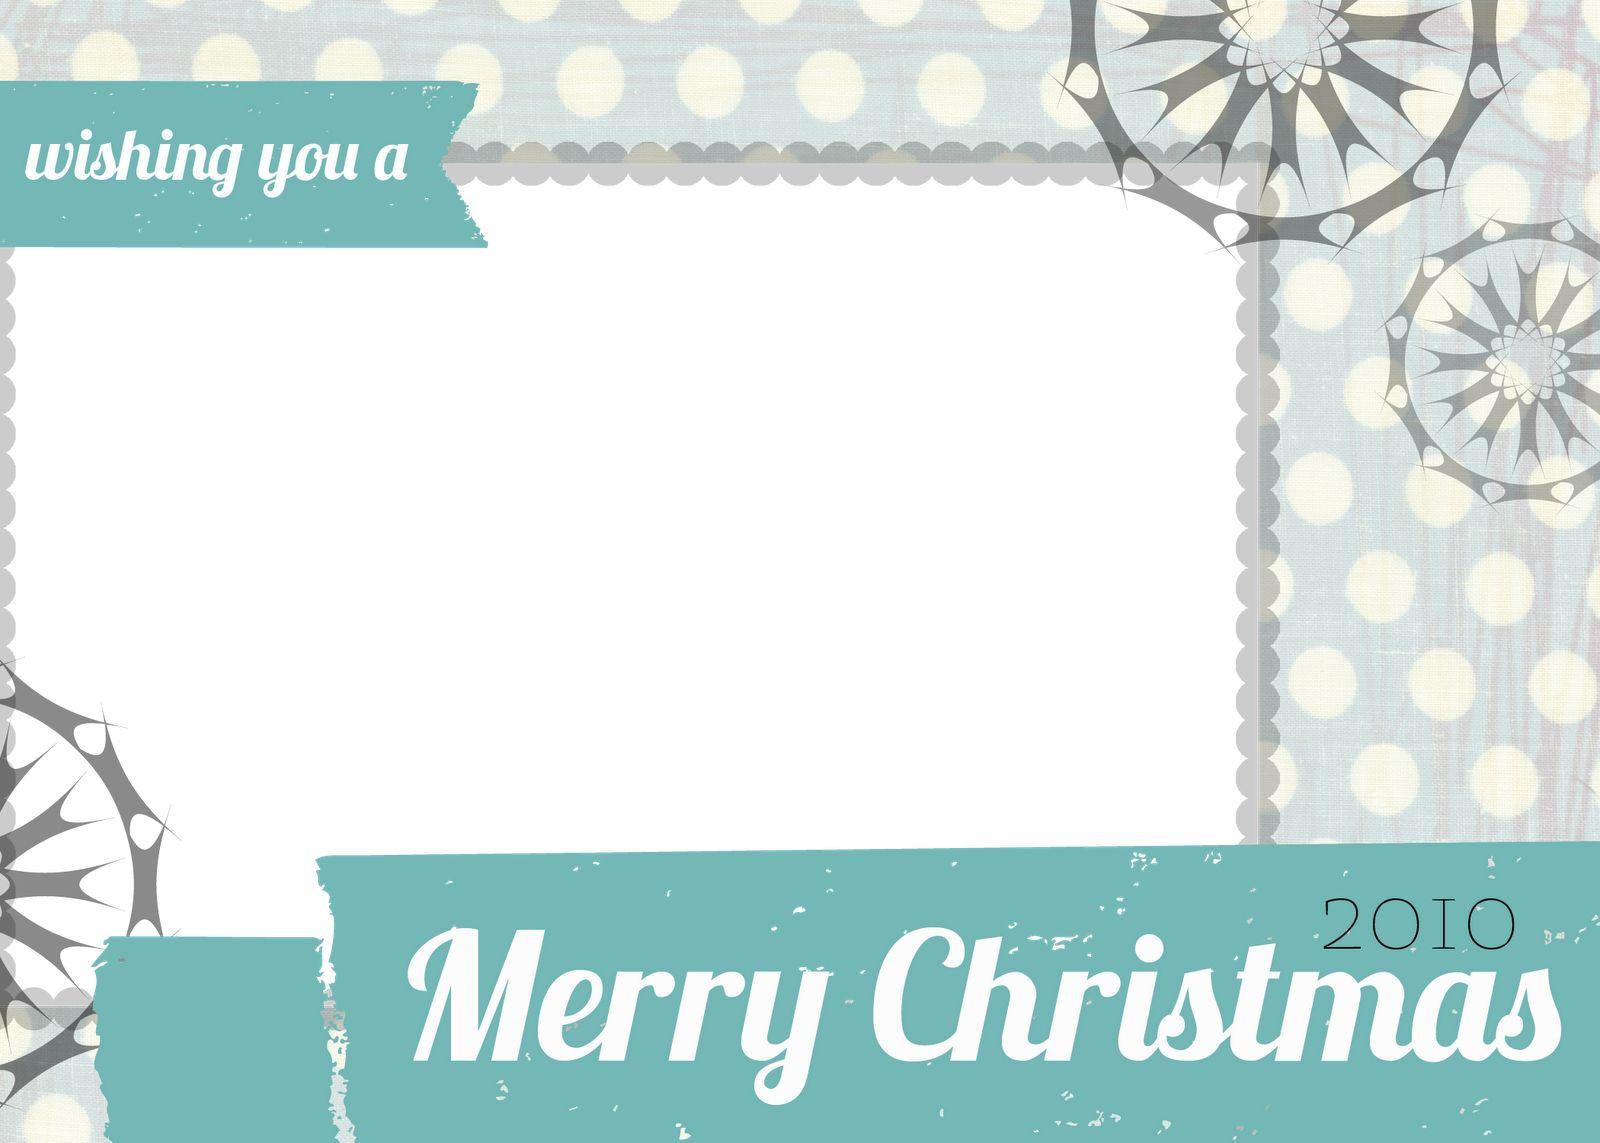 Free Printable Christmas Cards Stockings Design Free Printable Christmas Cards Holiday Card Template Free Printable Holiday Cards Christmas Card Template